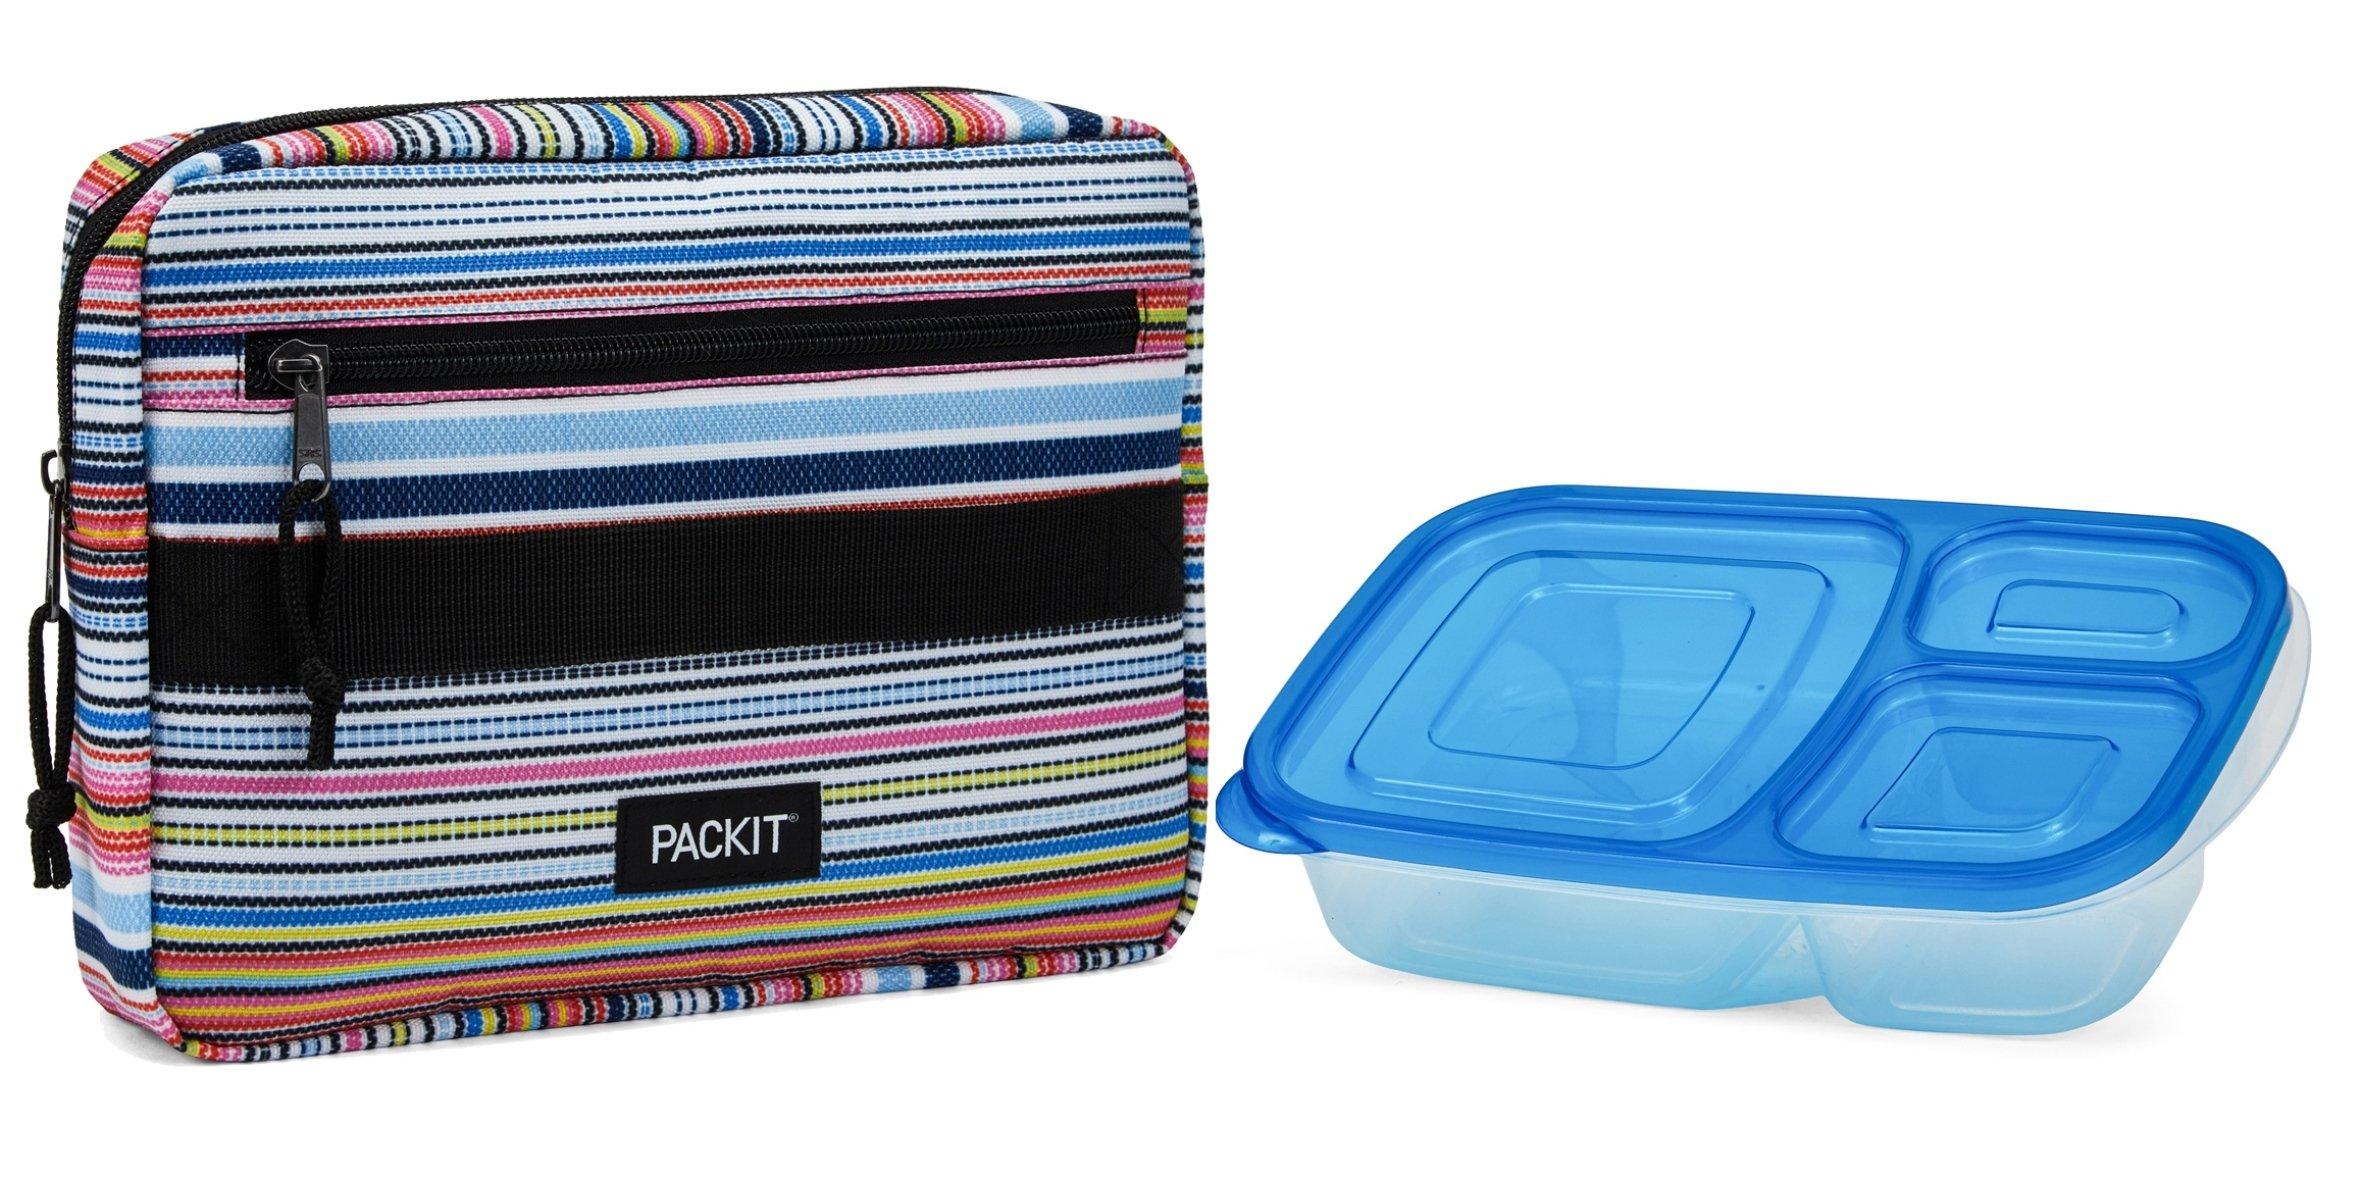 PackIt Freezable Bento Box Set: Freezable Sleeve and Reusable Bento Box Container, Blanket Stripe